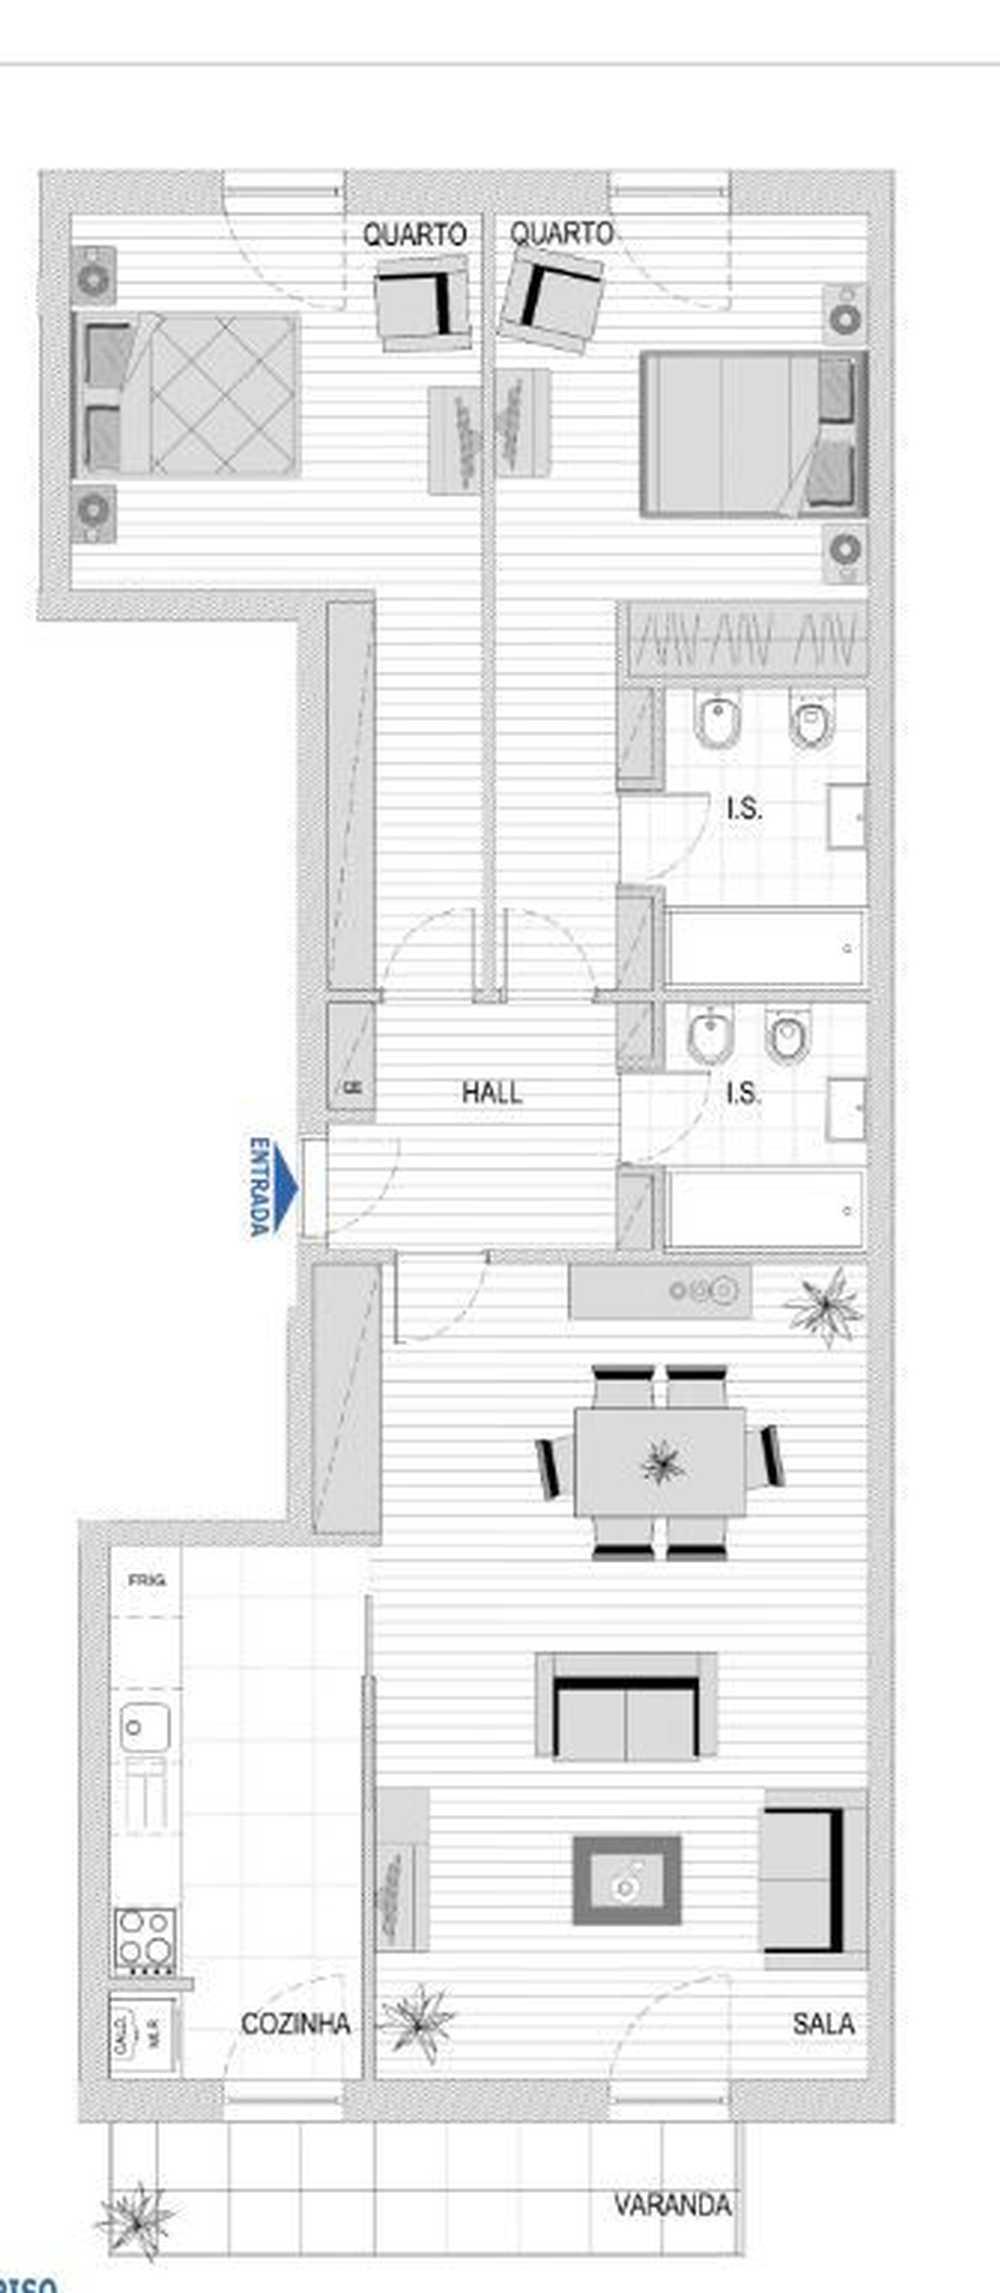 Matosinhos Matosinhos Apartment Bild 111236